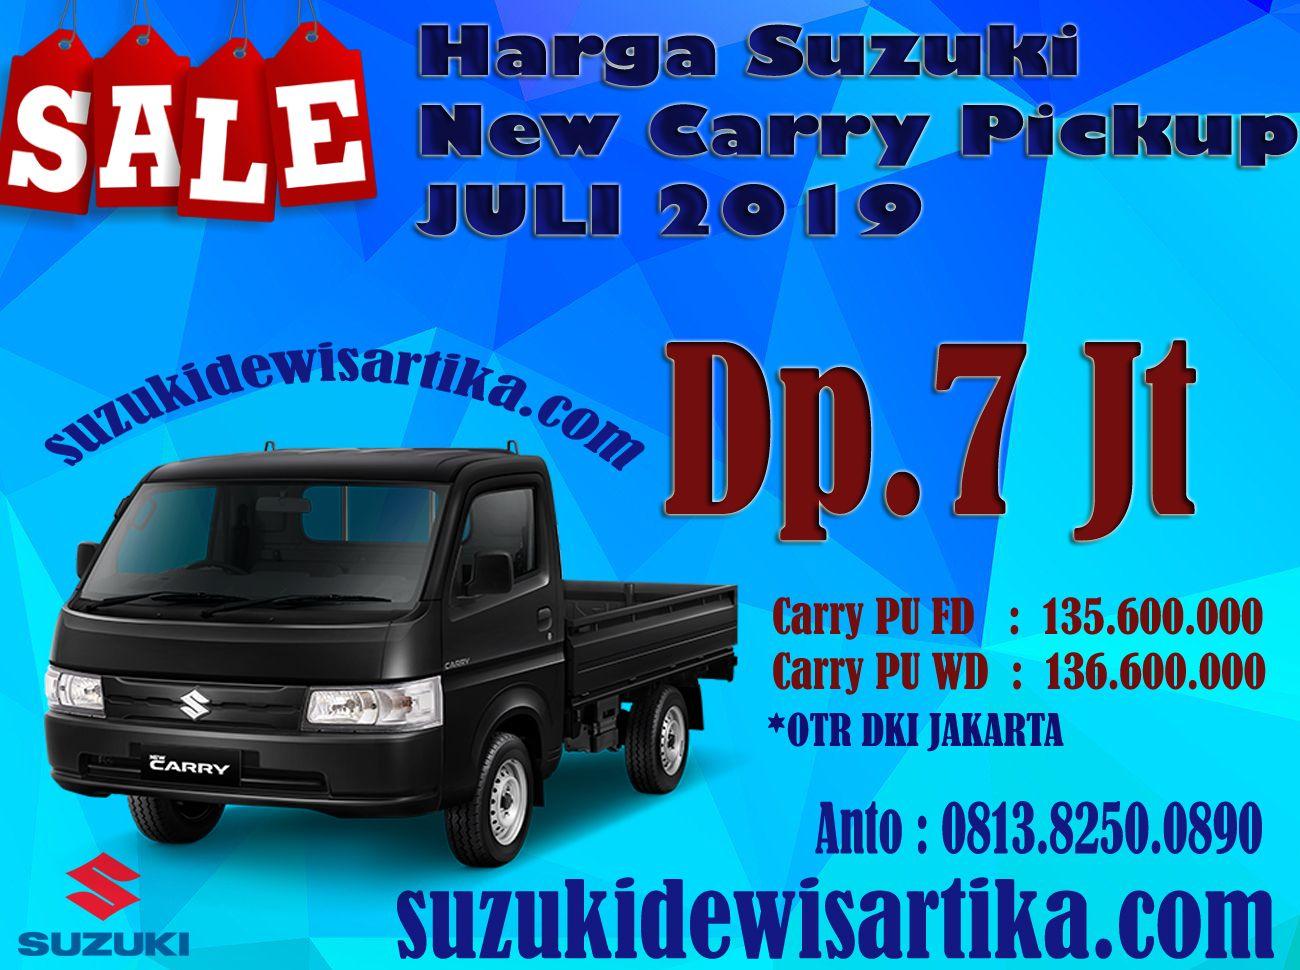 Harga Suzuki Carry Pickup Bulan Juli 2019 Hubungan